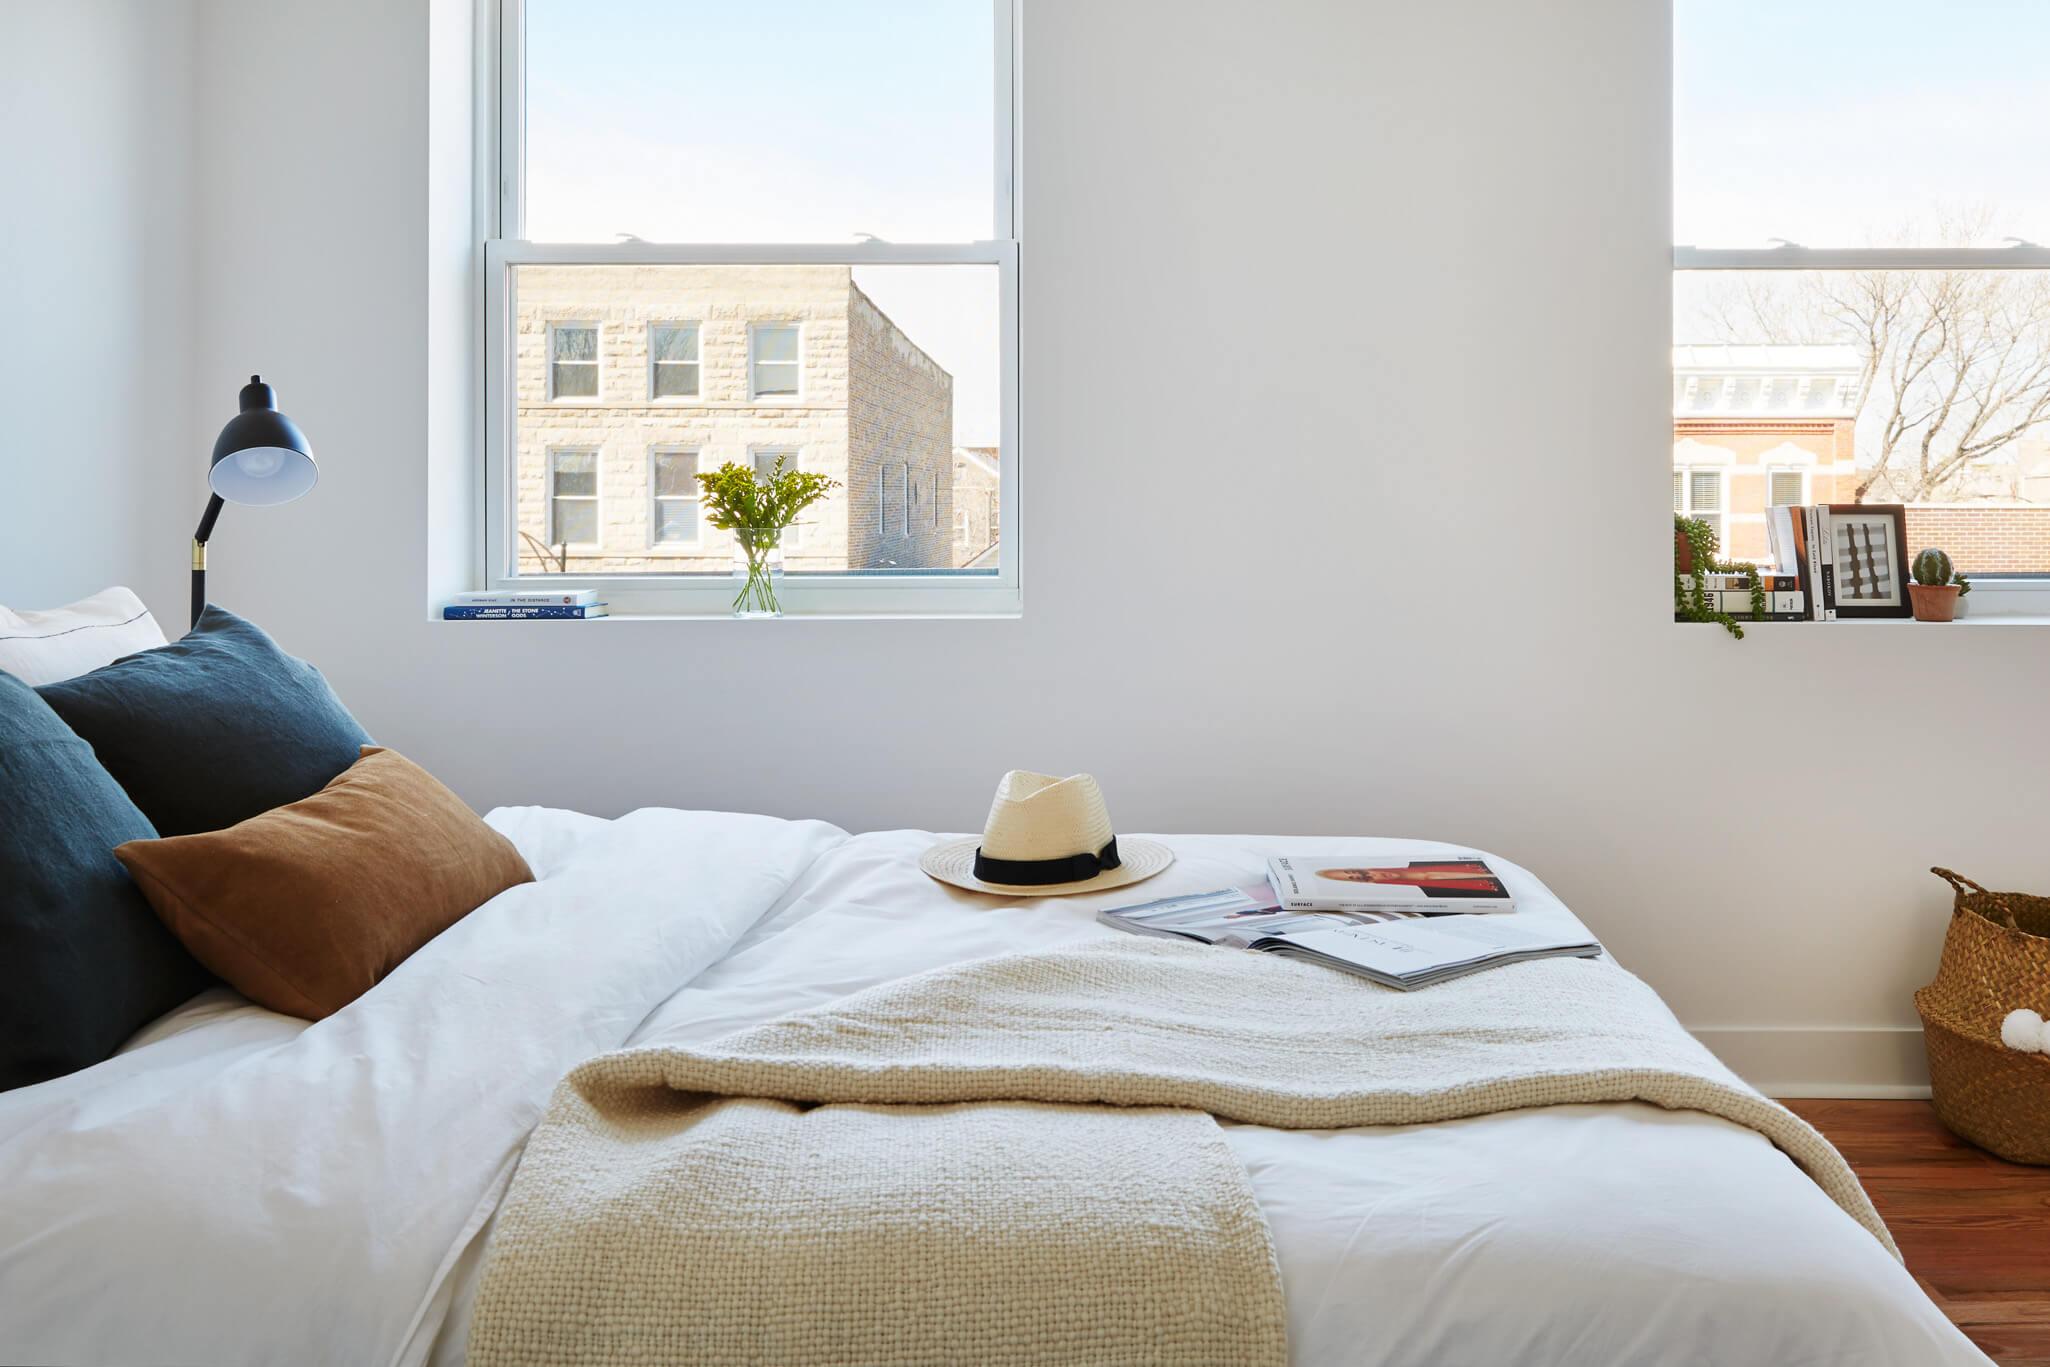 Rooms should serves as your sanctuary